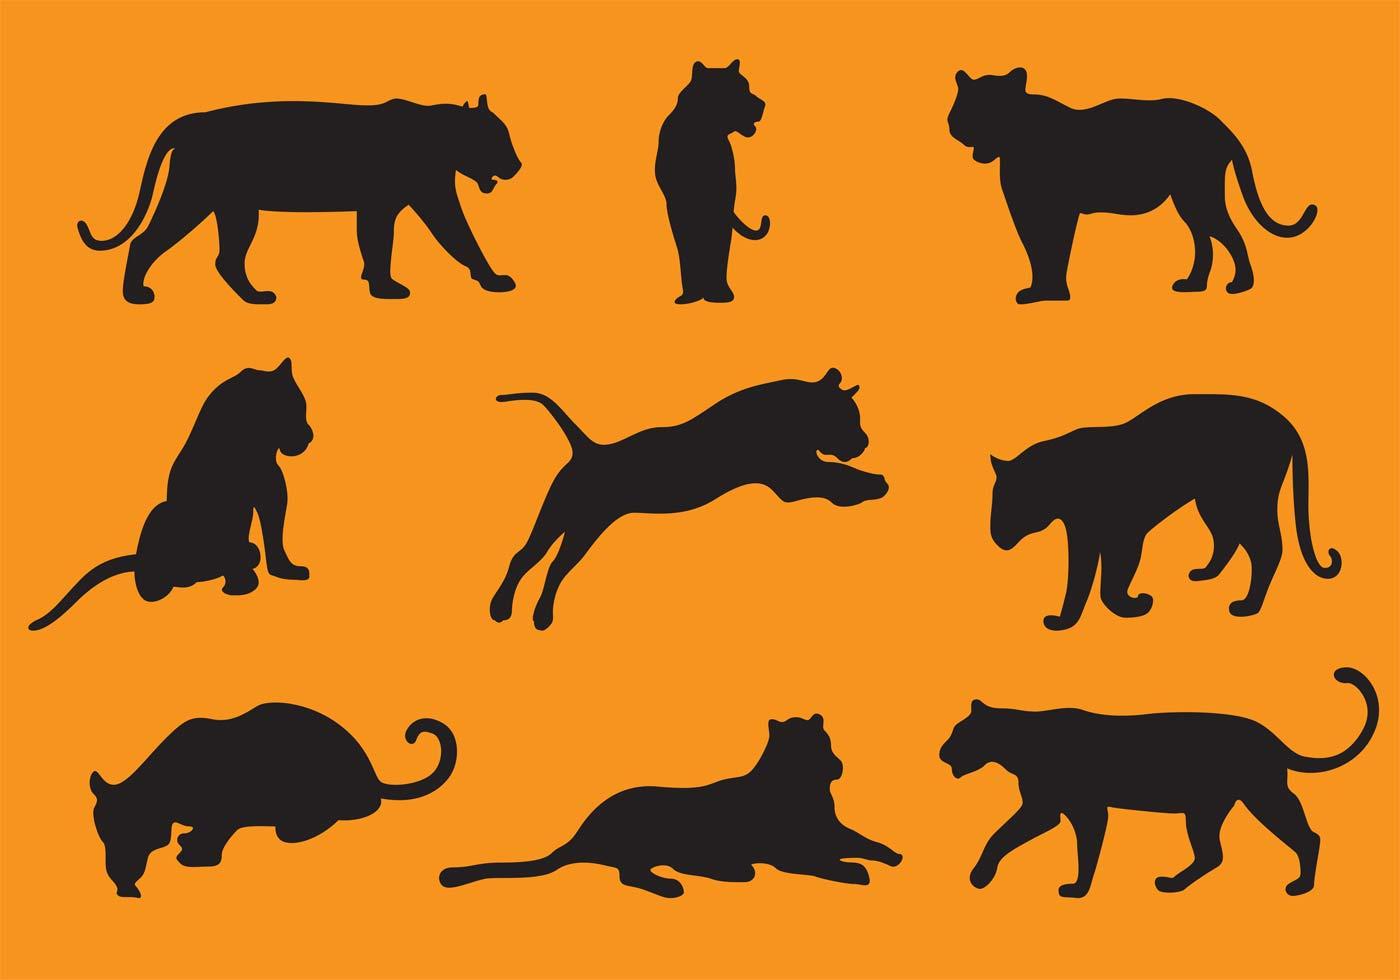 Tiger Silhouette Vectors Download Free Vector Art Stock